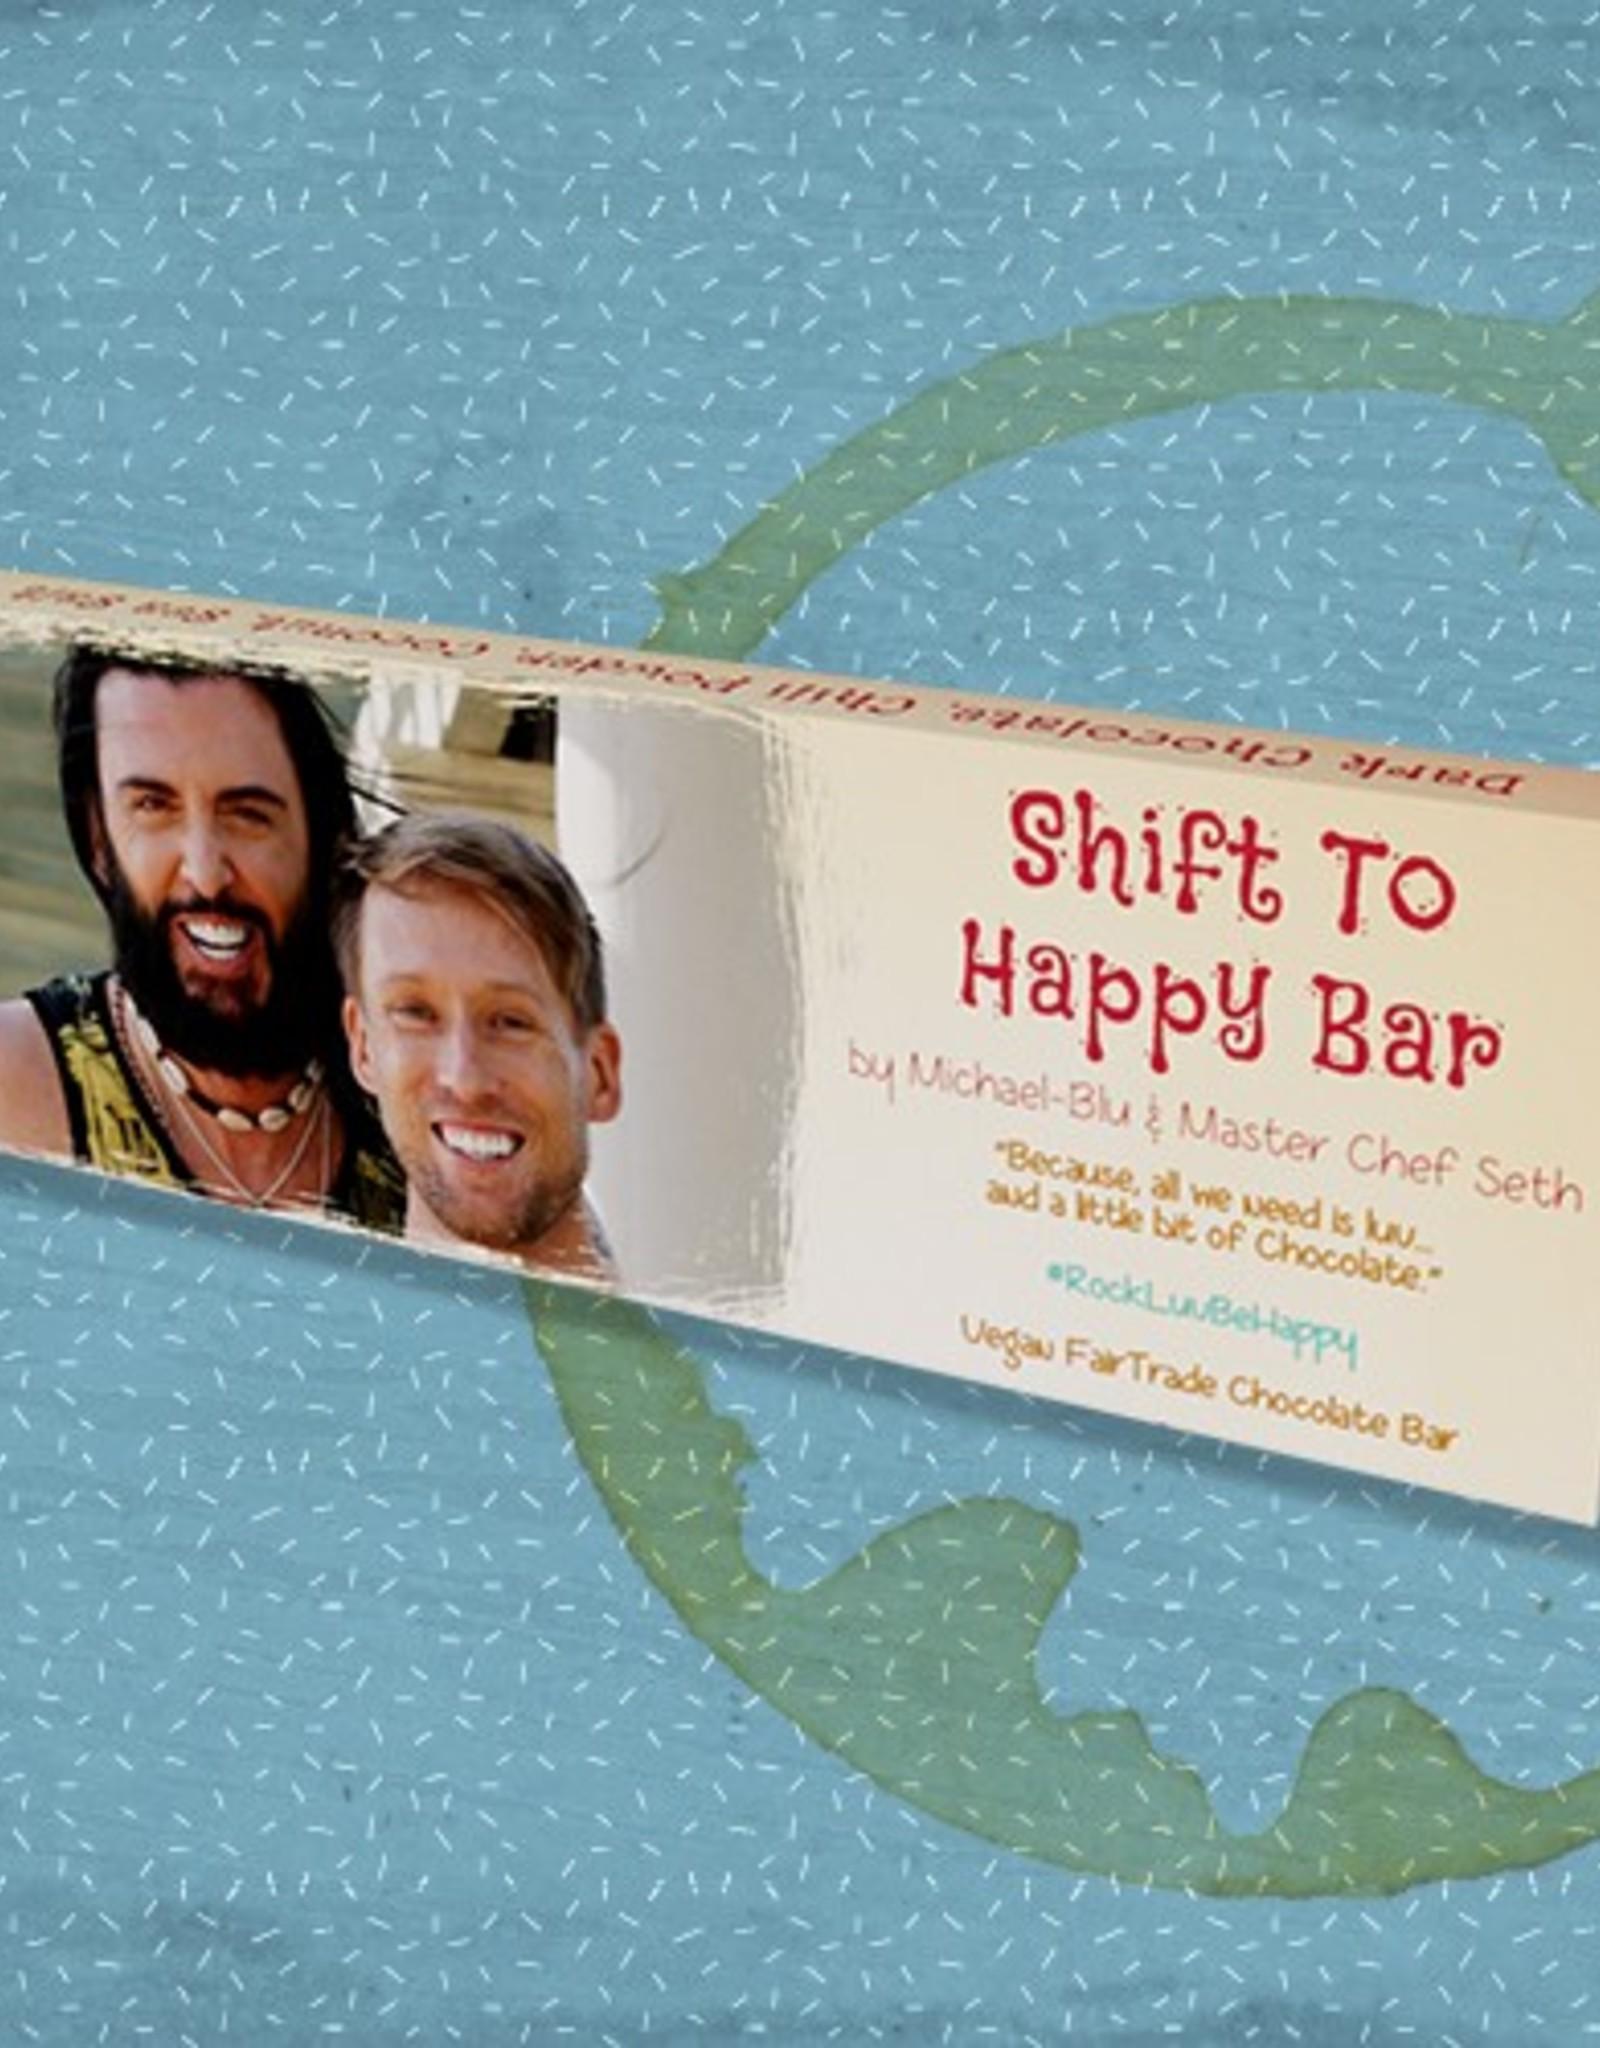 Shift to Happy Bar